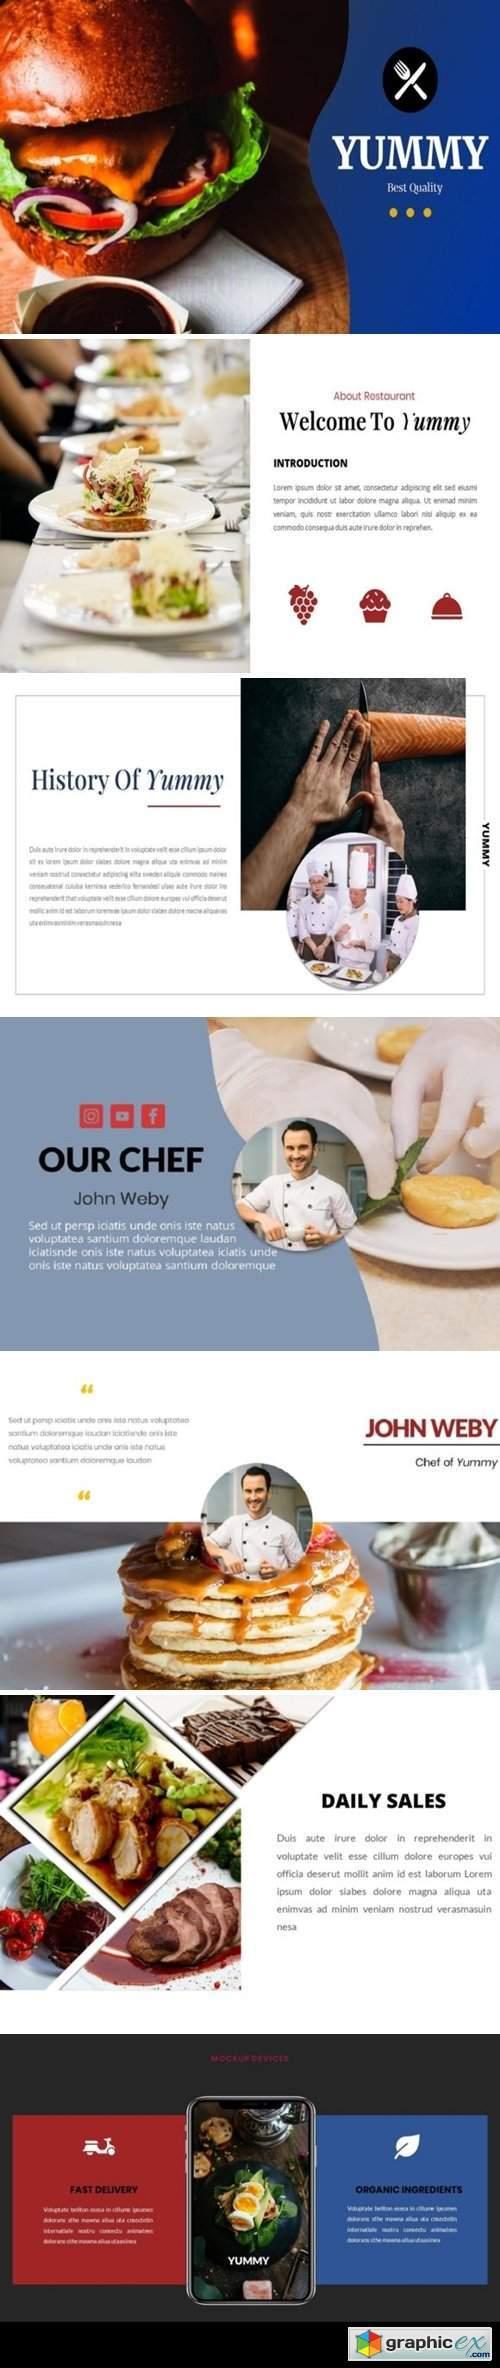 Yummy - Restaurant Powerpoint Template